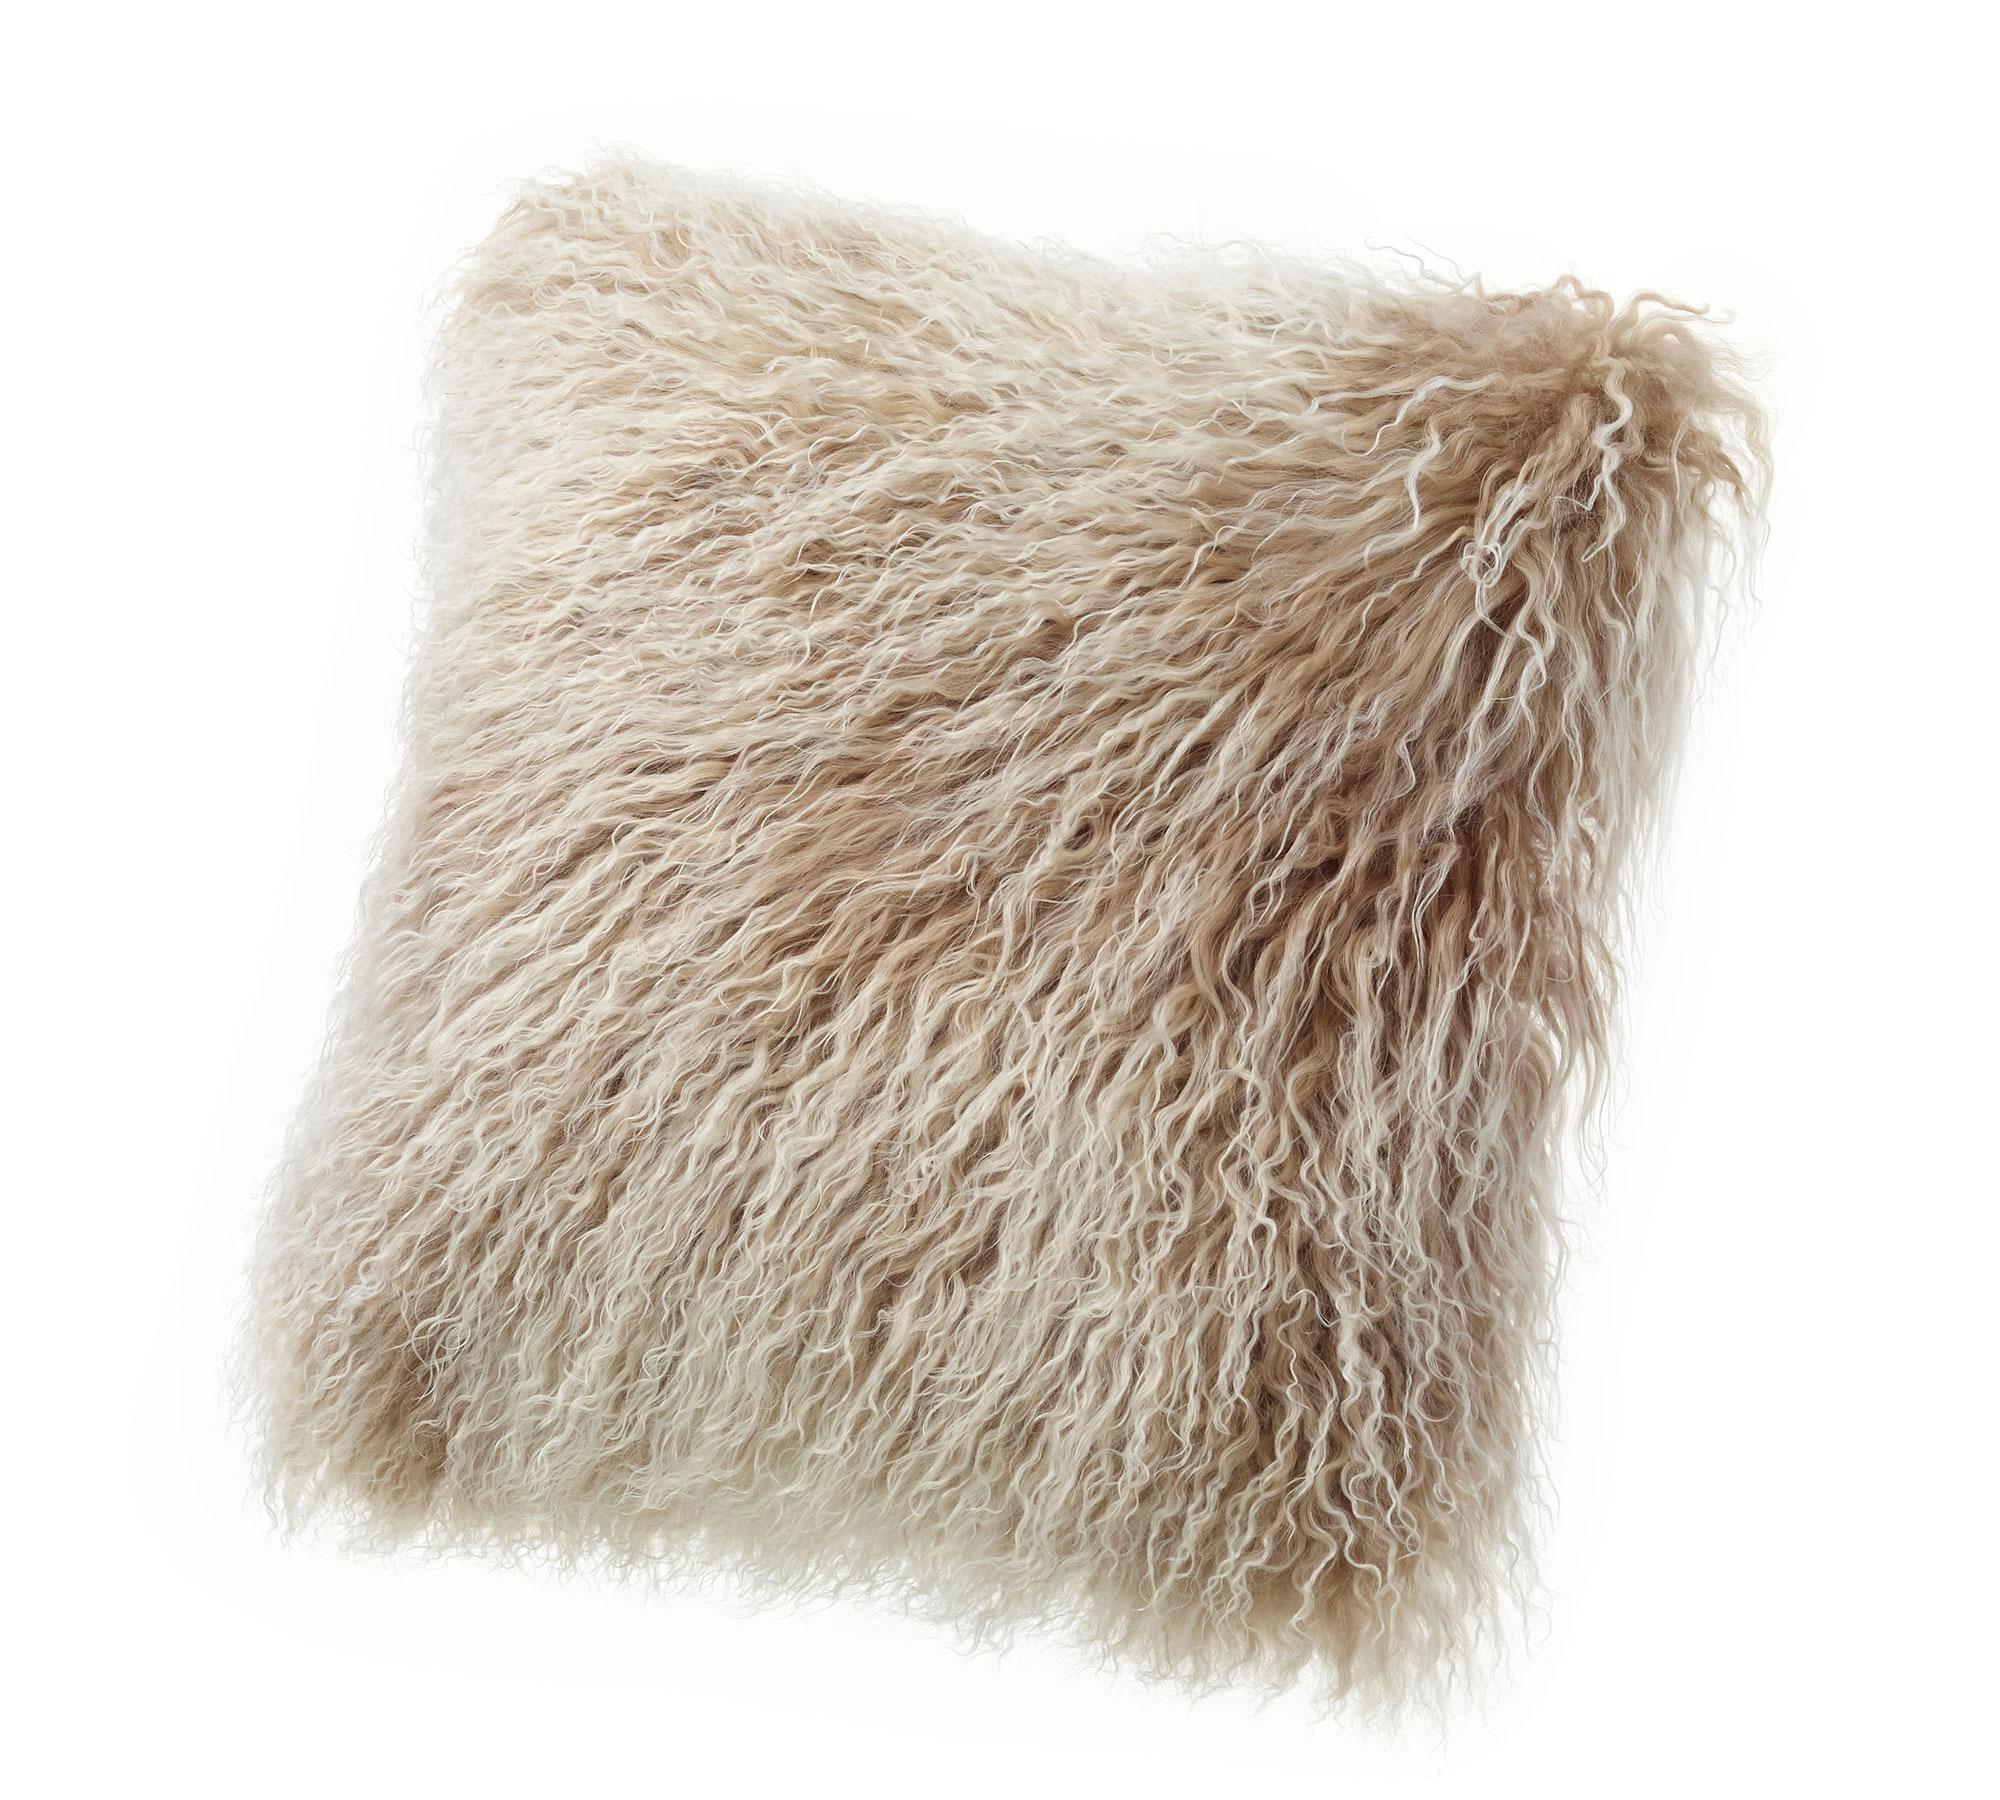 Tibetan Lambskin Curly Fur throw pillows tan